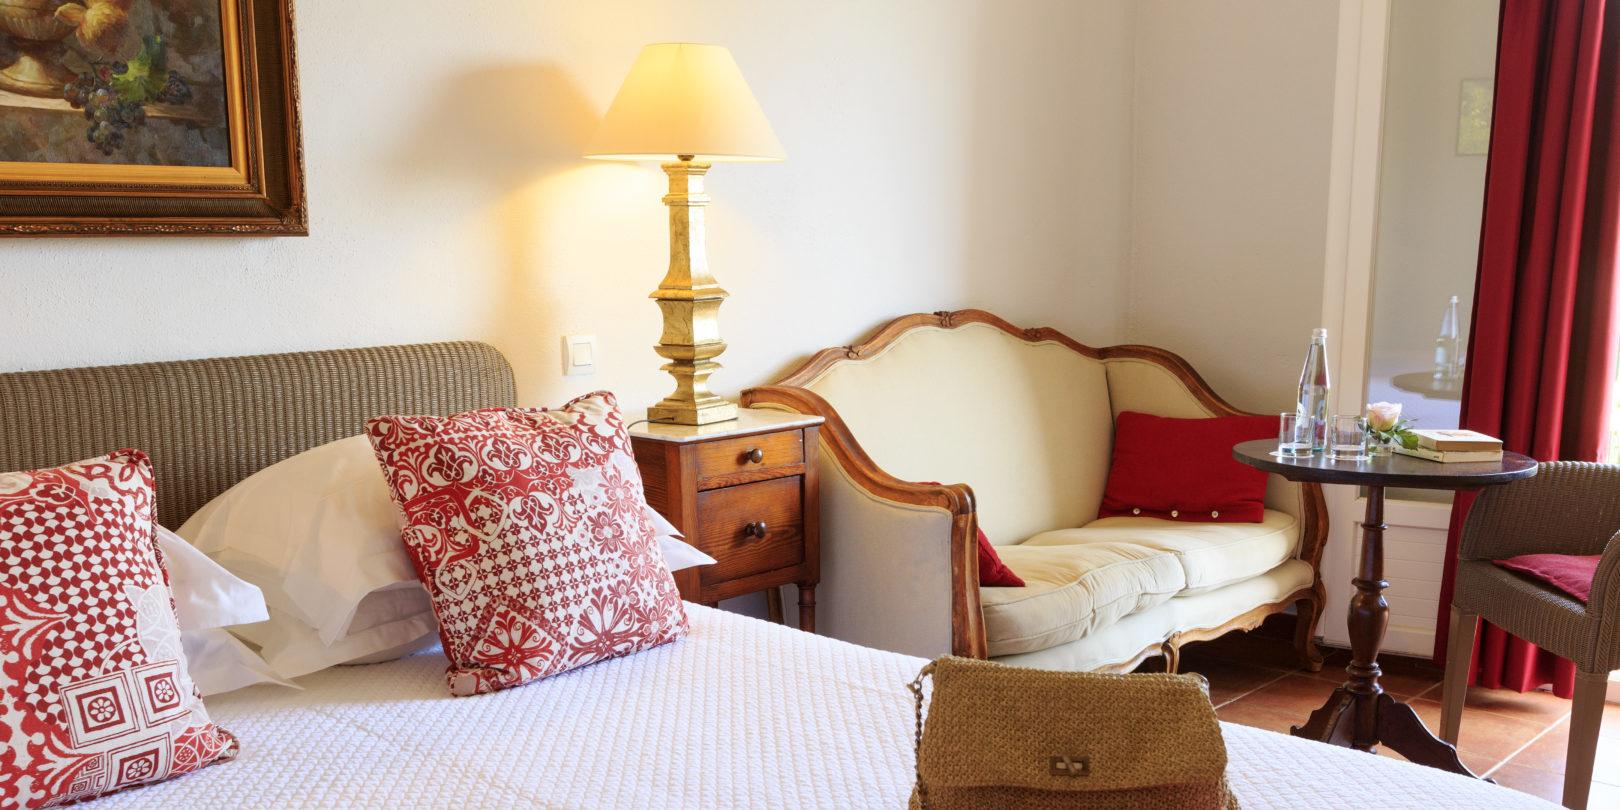 Hotel Demeure Castel Brando Erbalunga Cap Corse Corsica Frankrijk kamer privilege ontdekcorsica.nl skimaquis reisorganisatie